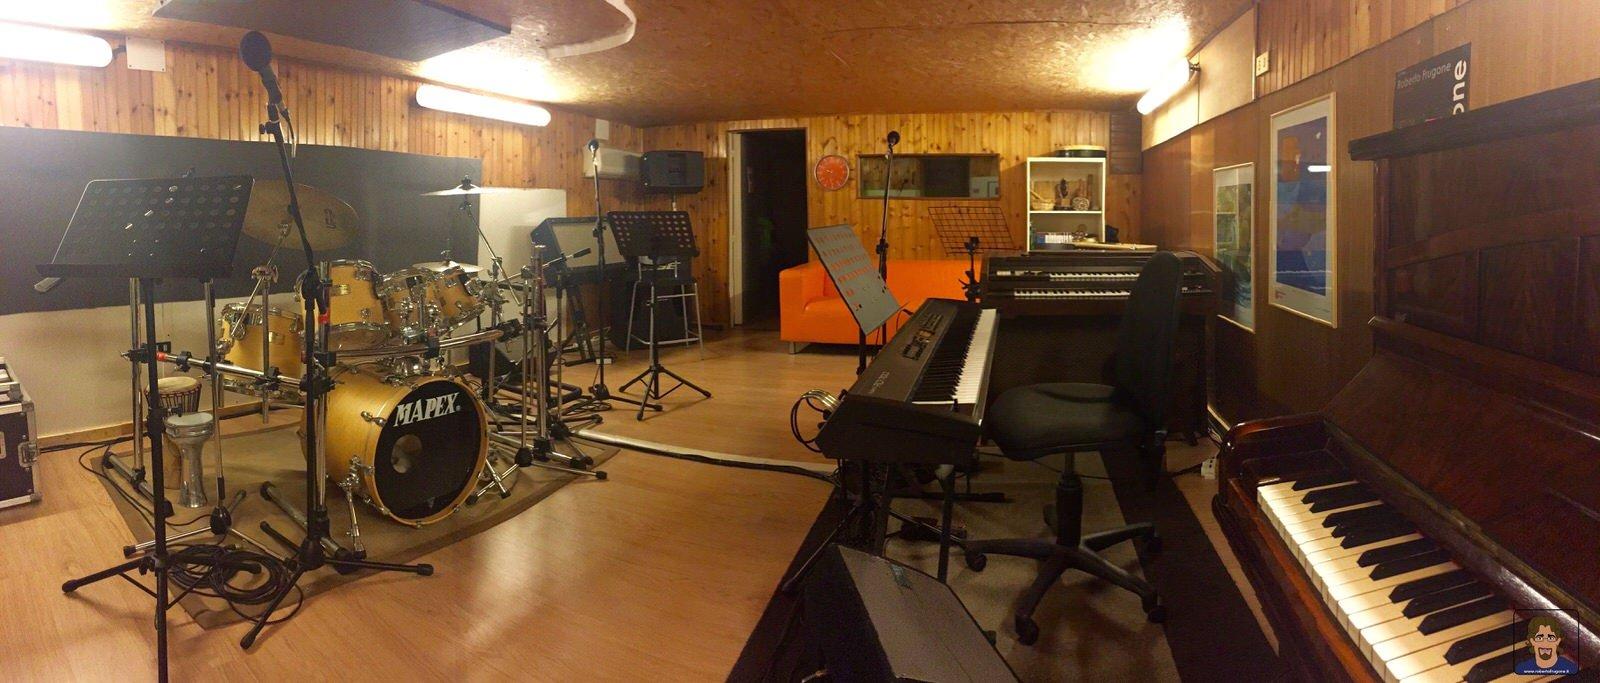 Totem Studio Sala Prove Musicali Casarza Ligure 01